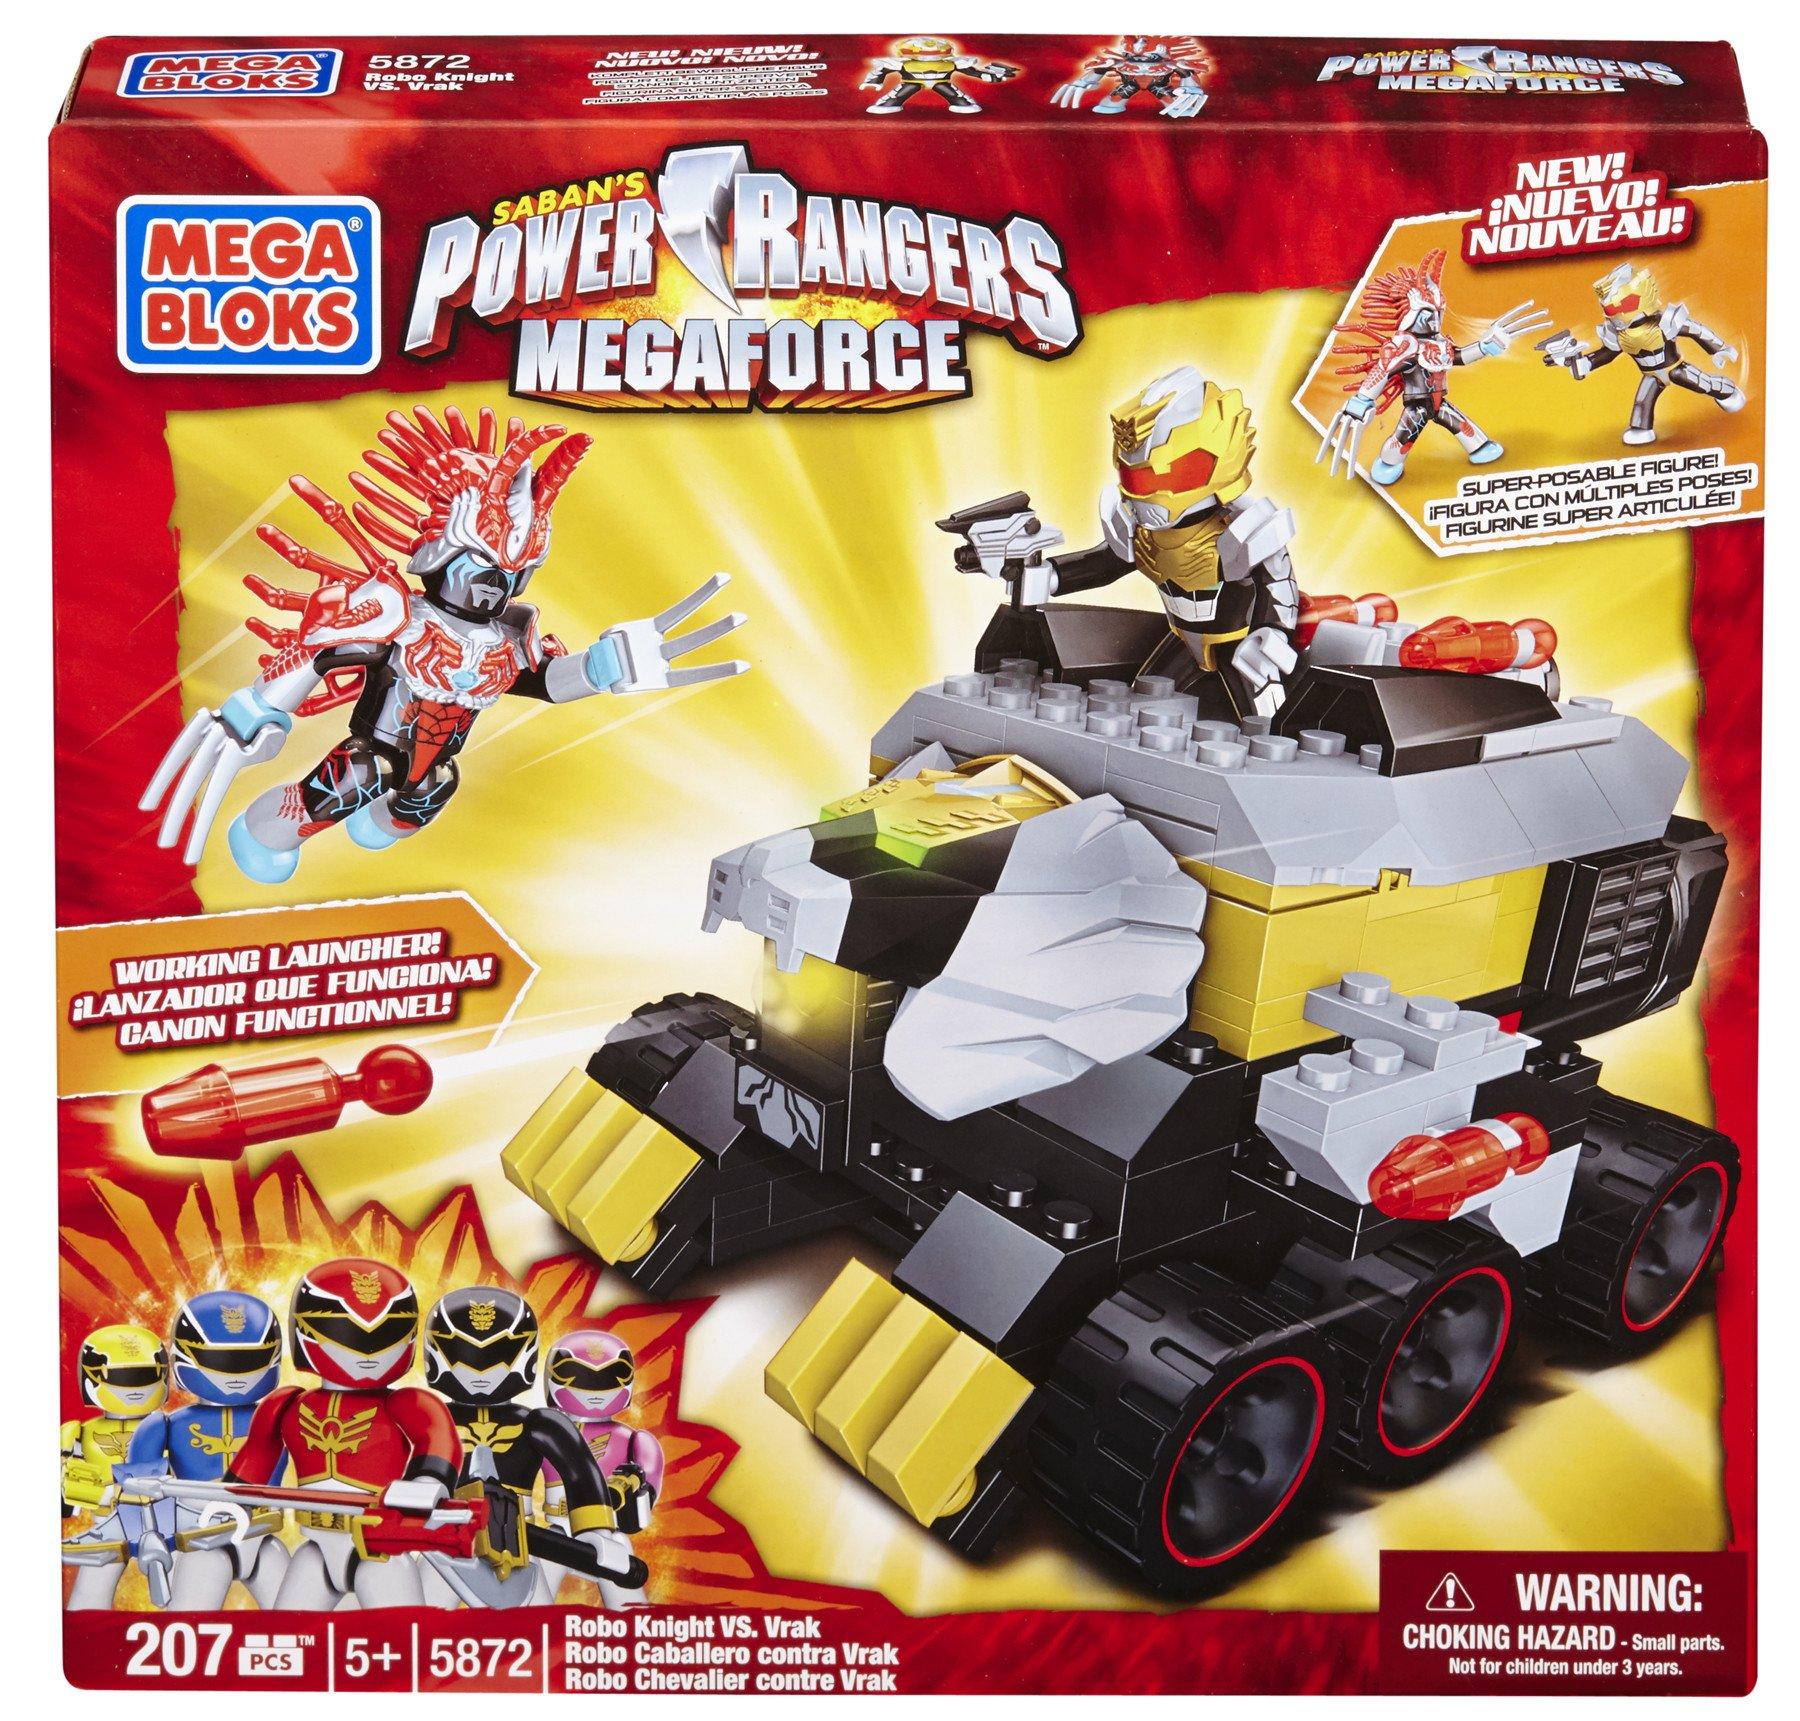 Mega Bloks Power Rangers Megaforce - Robo Knight vs. Vrak